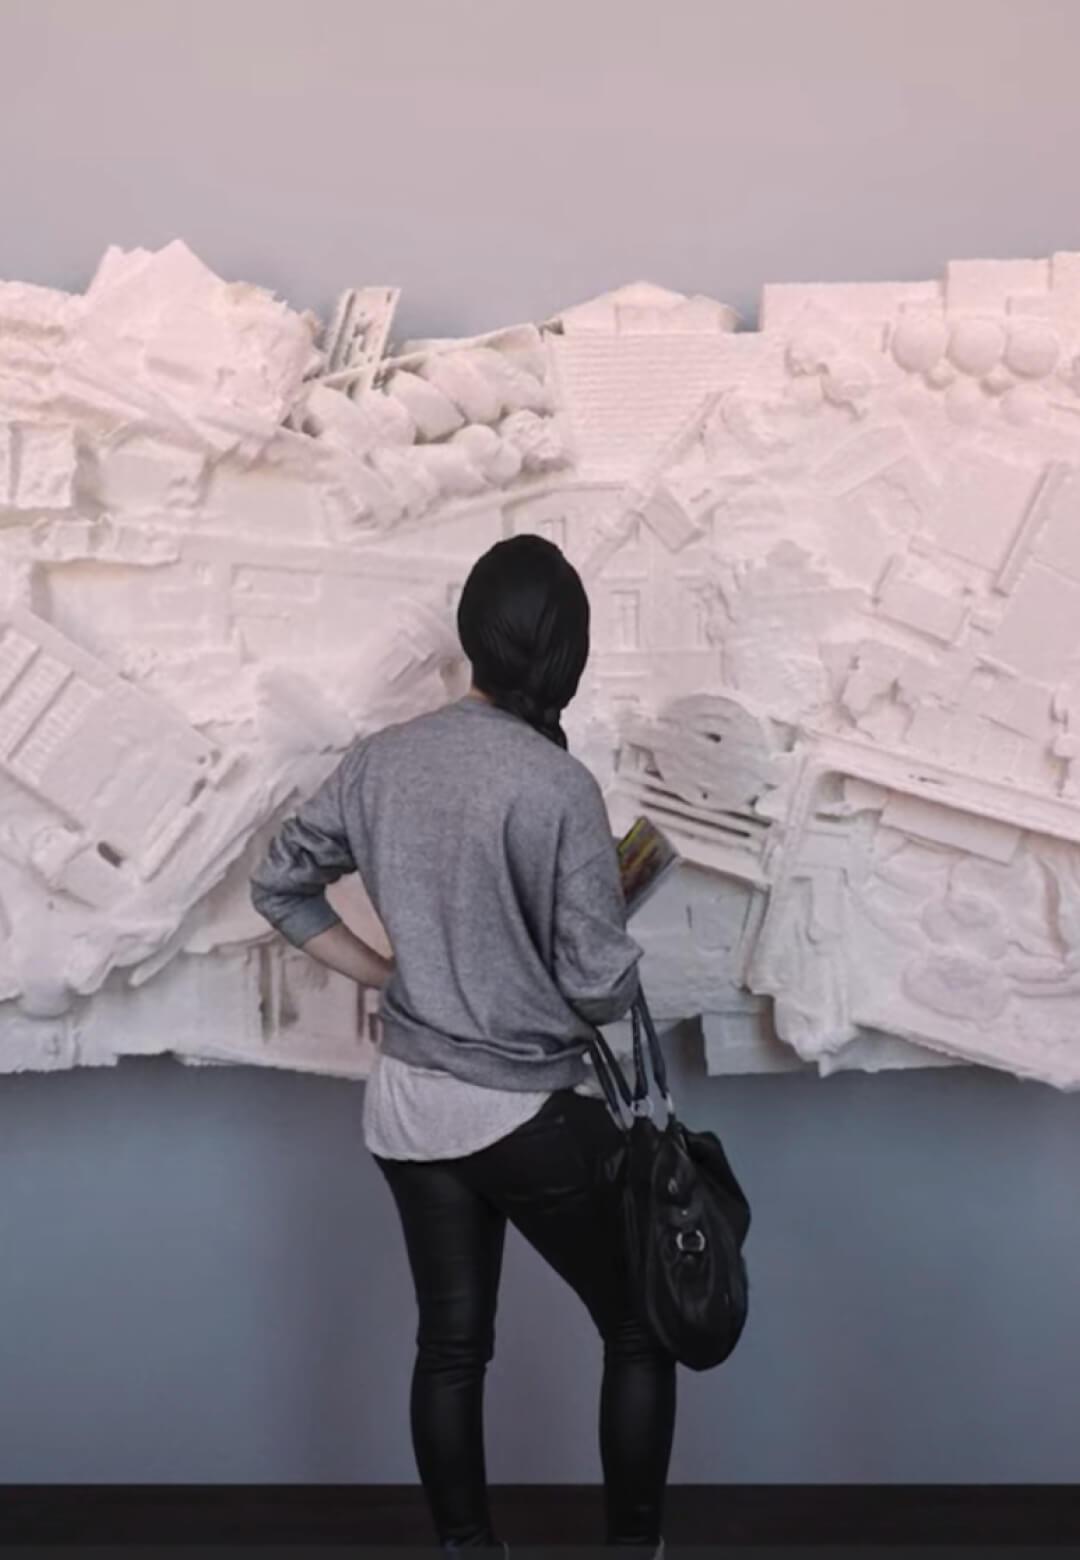 'Reinventing Texture' by Toshiki Hirano at the London Design Biennale 2021 | London Design Biennale 2021 | Interview | STIRworld